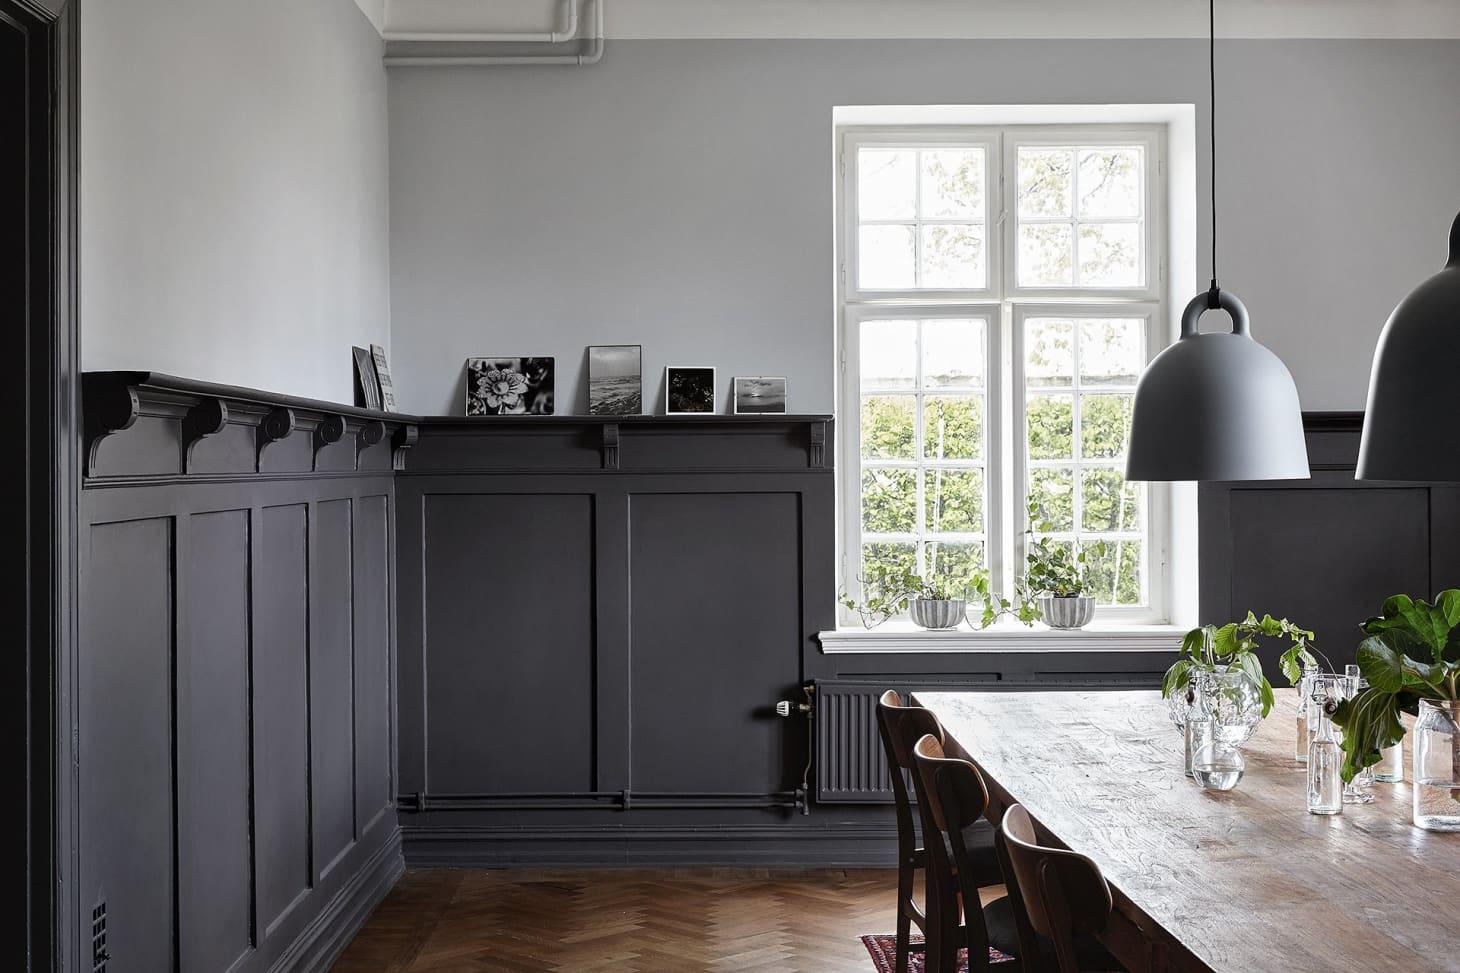 Wood Trim Details: A Secret to Beautiful Room Remodels